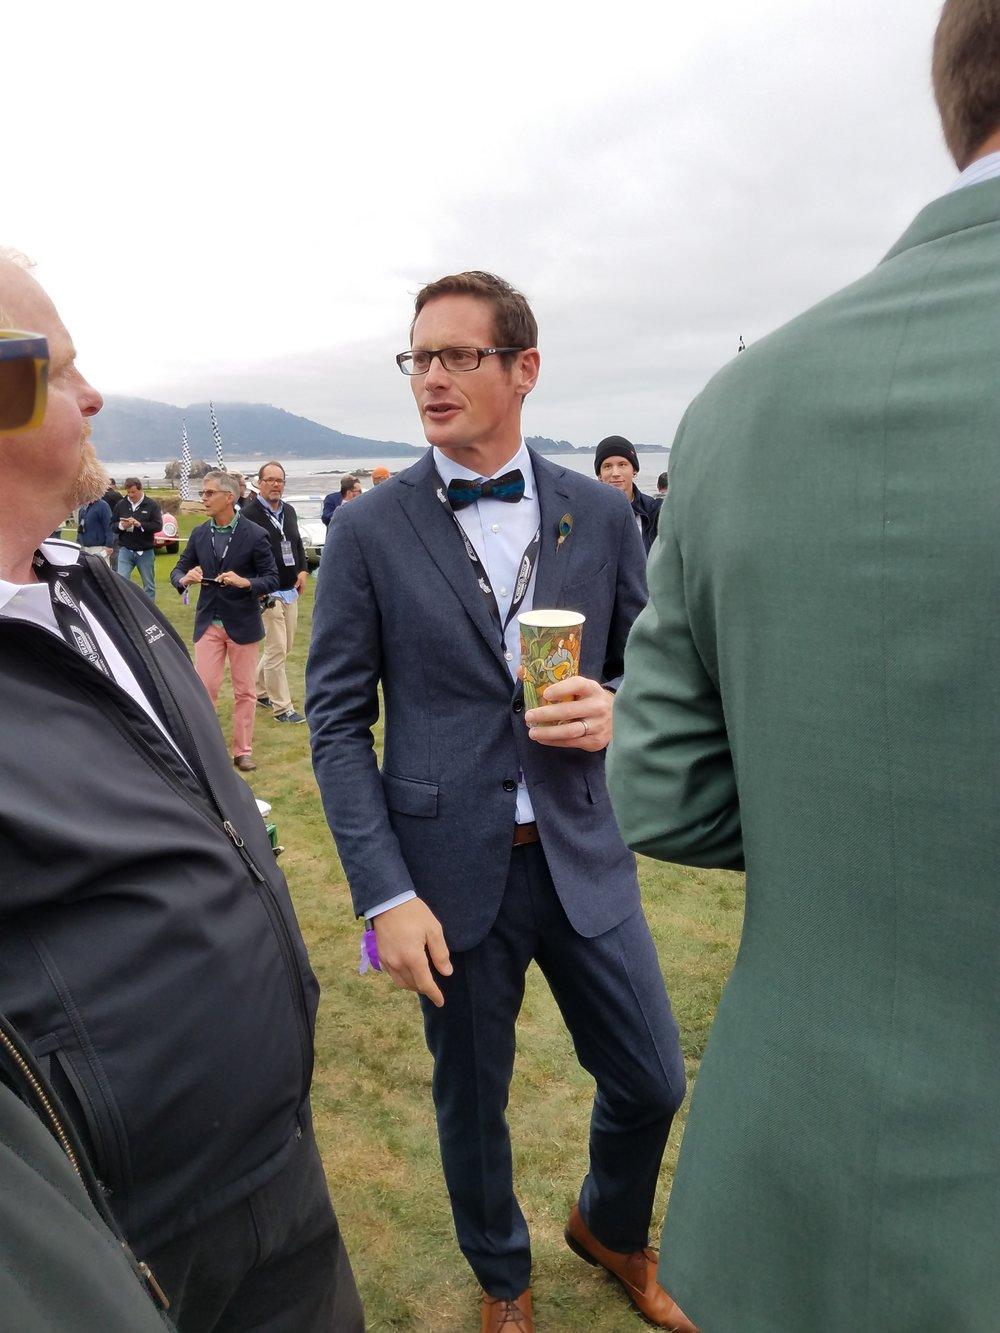 Gunnar rocking the bow tie.